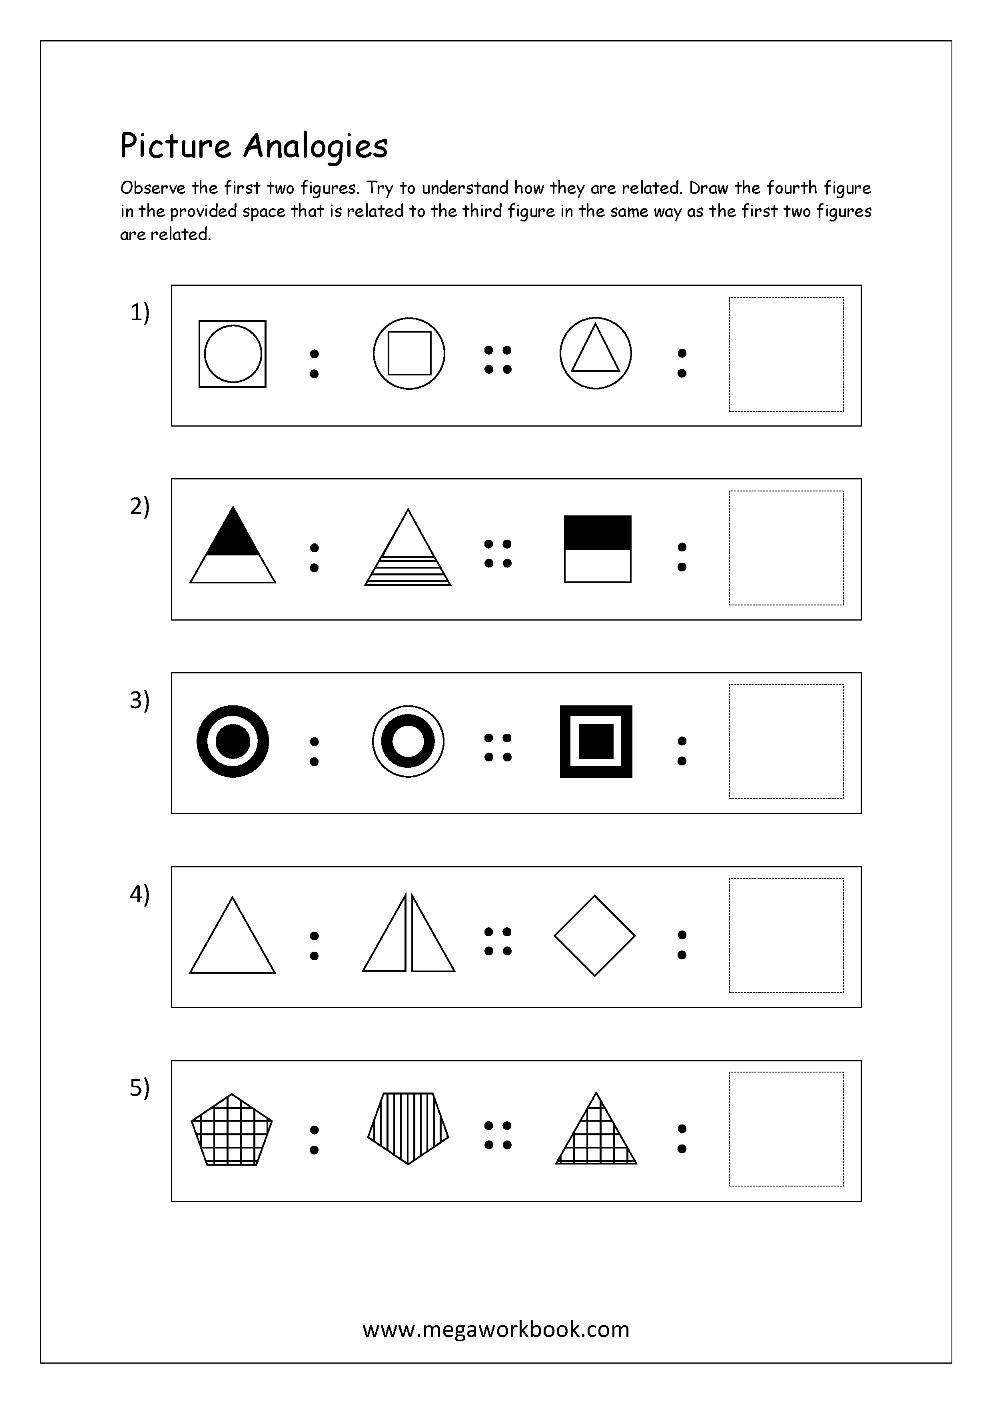 Free Printable Picture Analogy Worksheets - Logical Reasoning